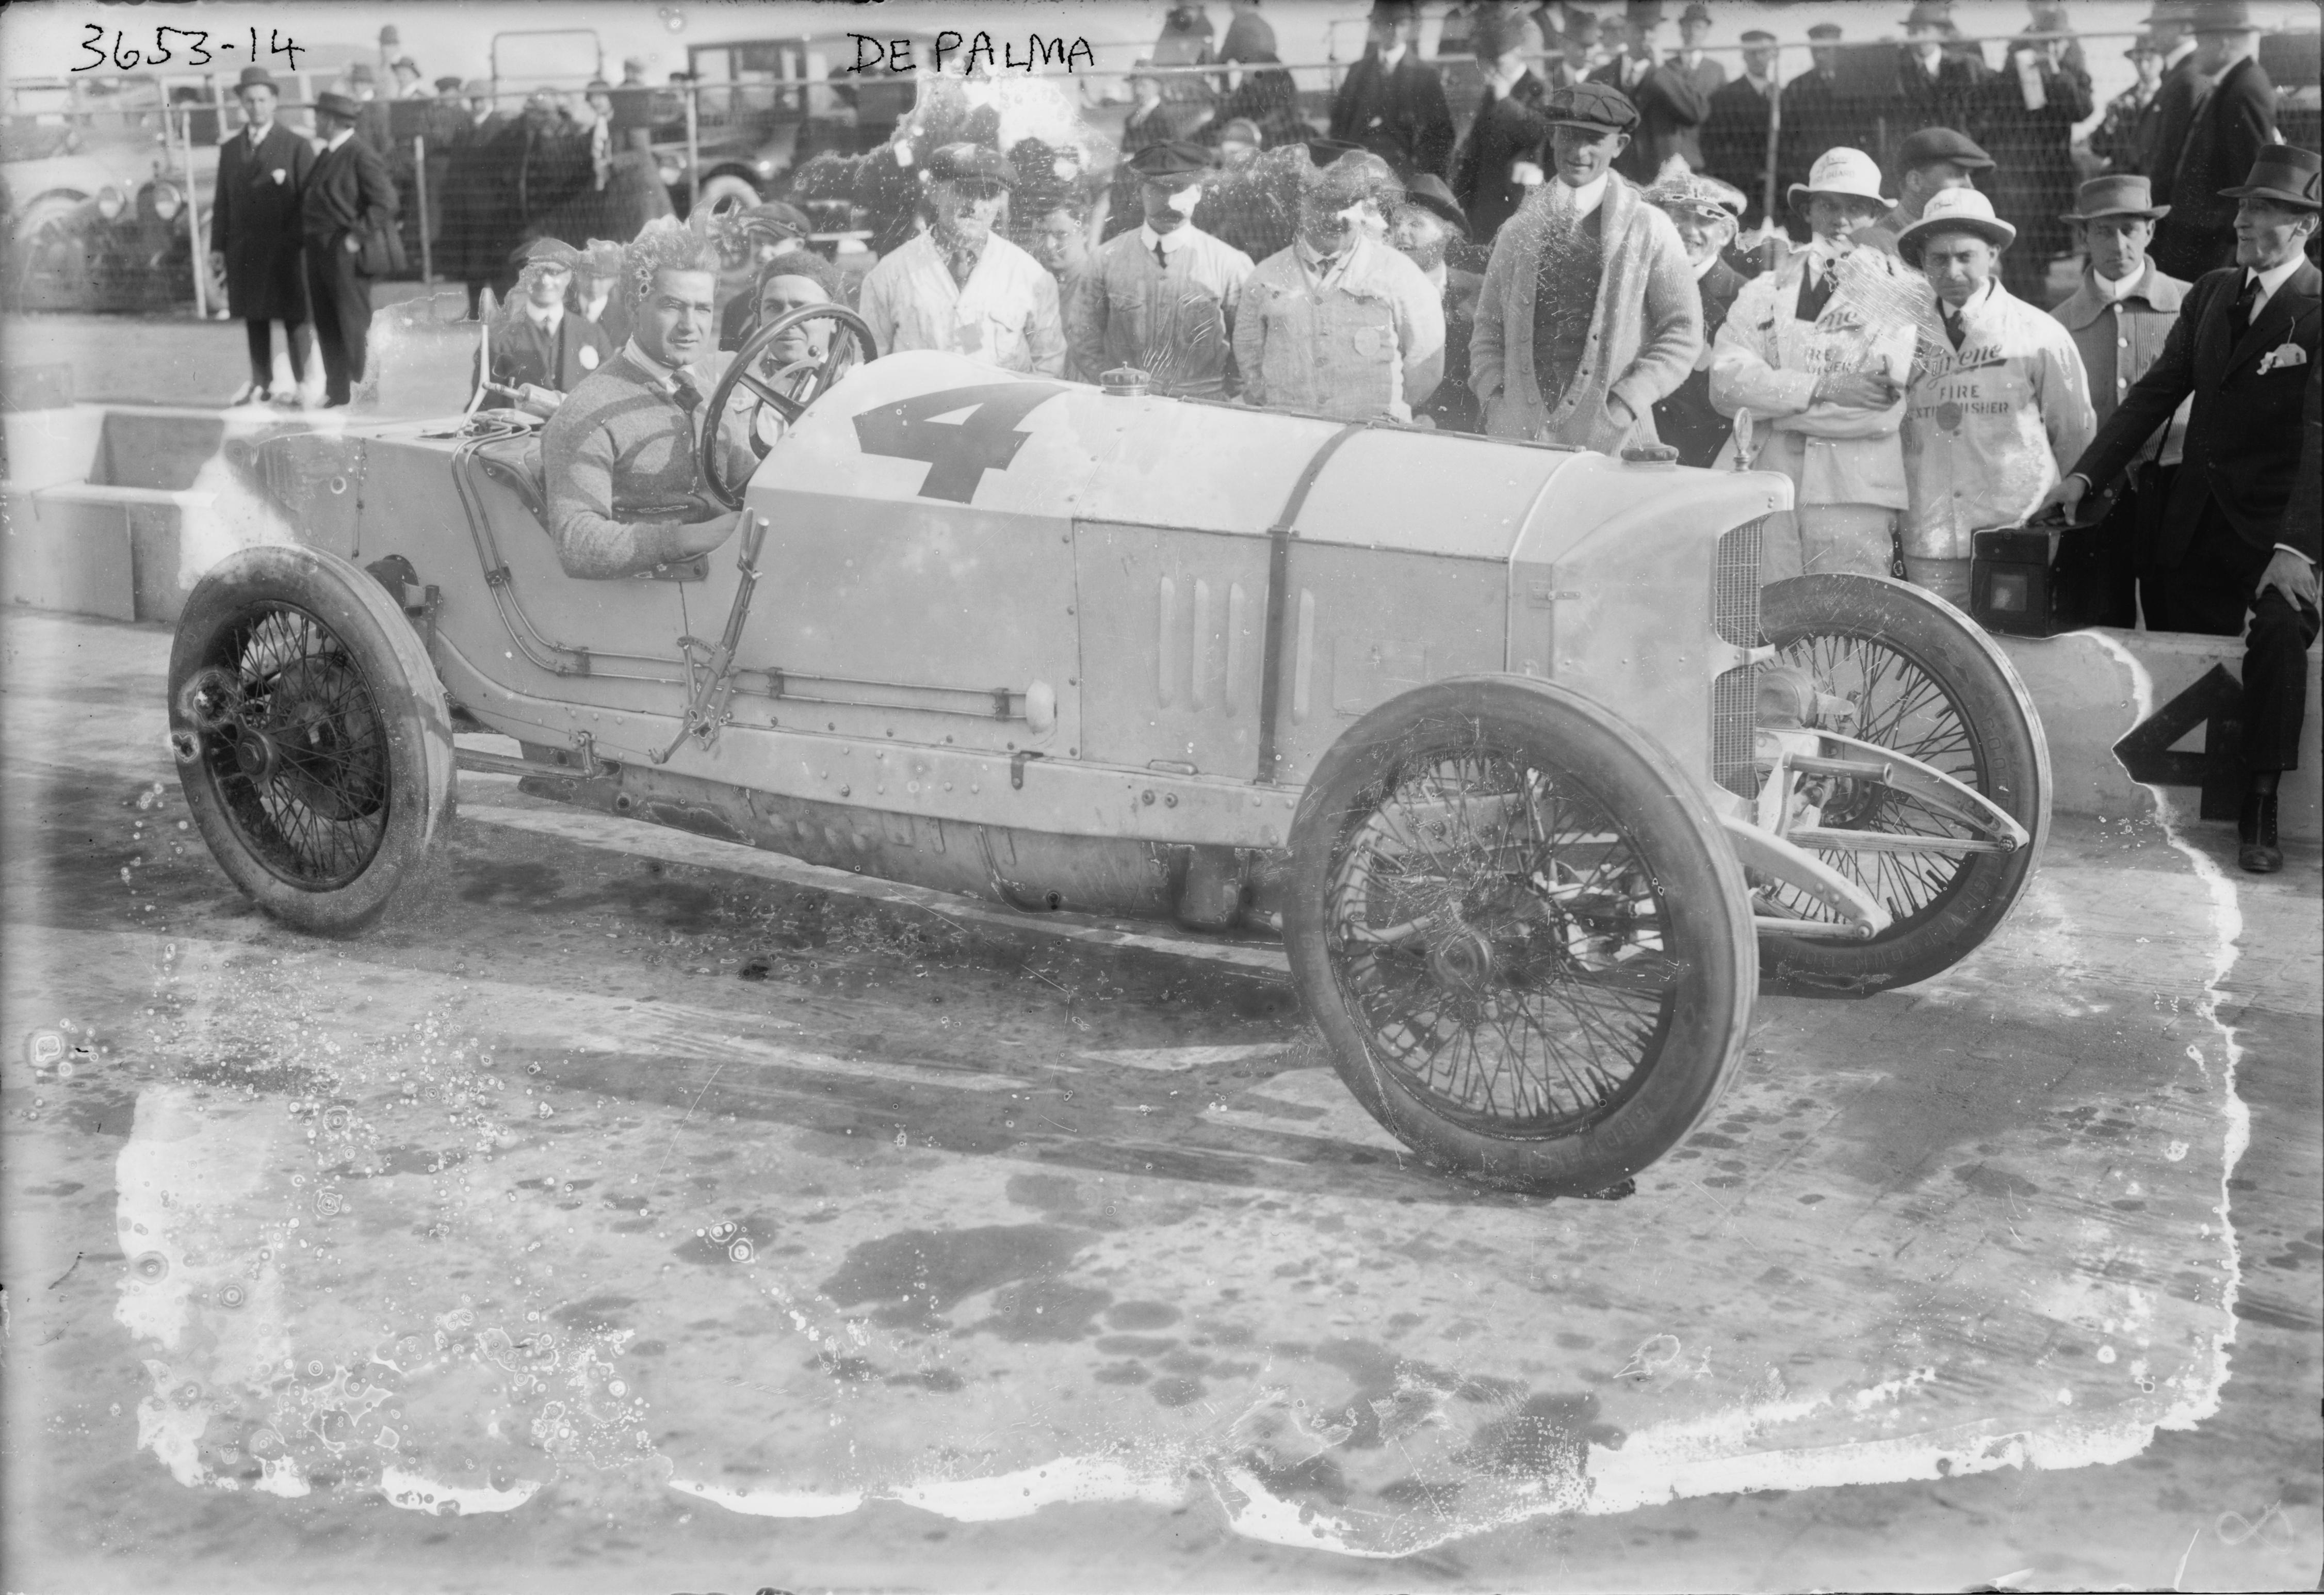 FileRalph DePalma 1882 1956 At The 1915 Indianapolis 500 2